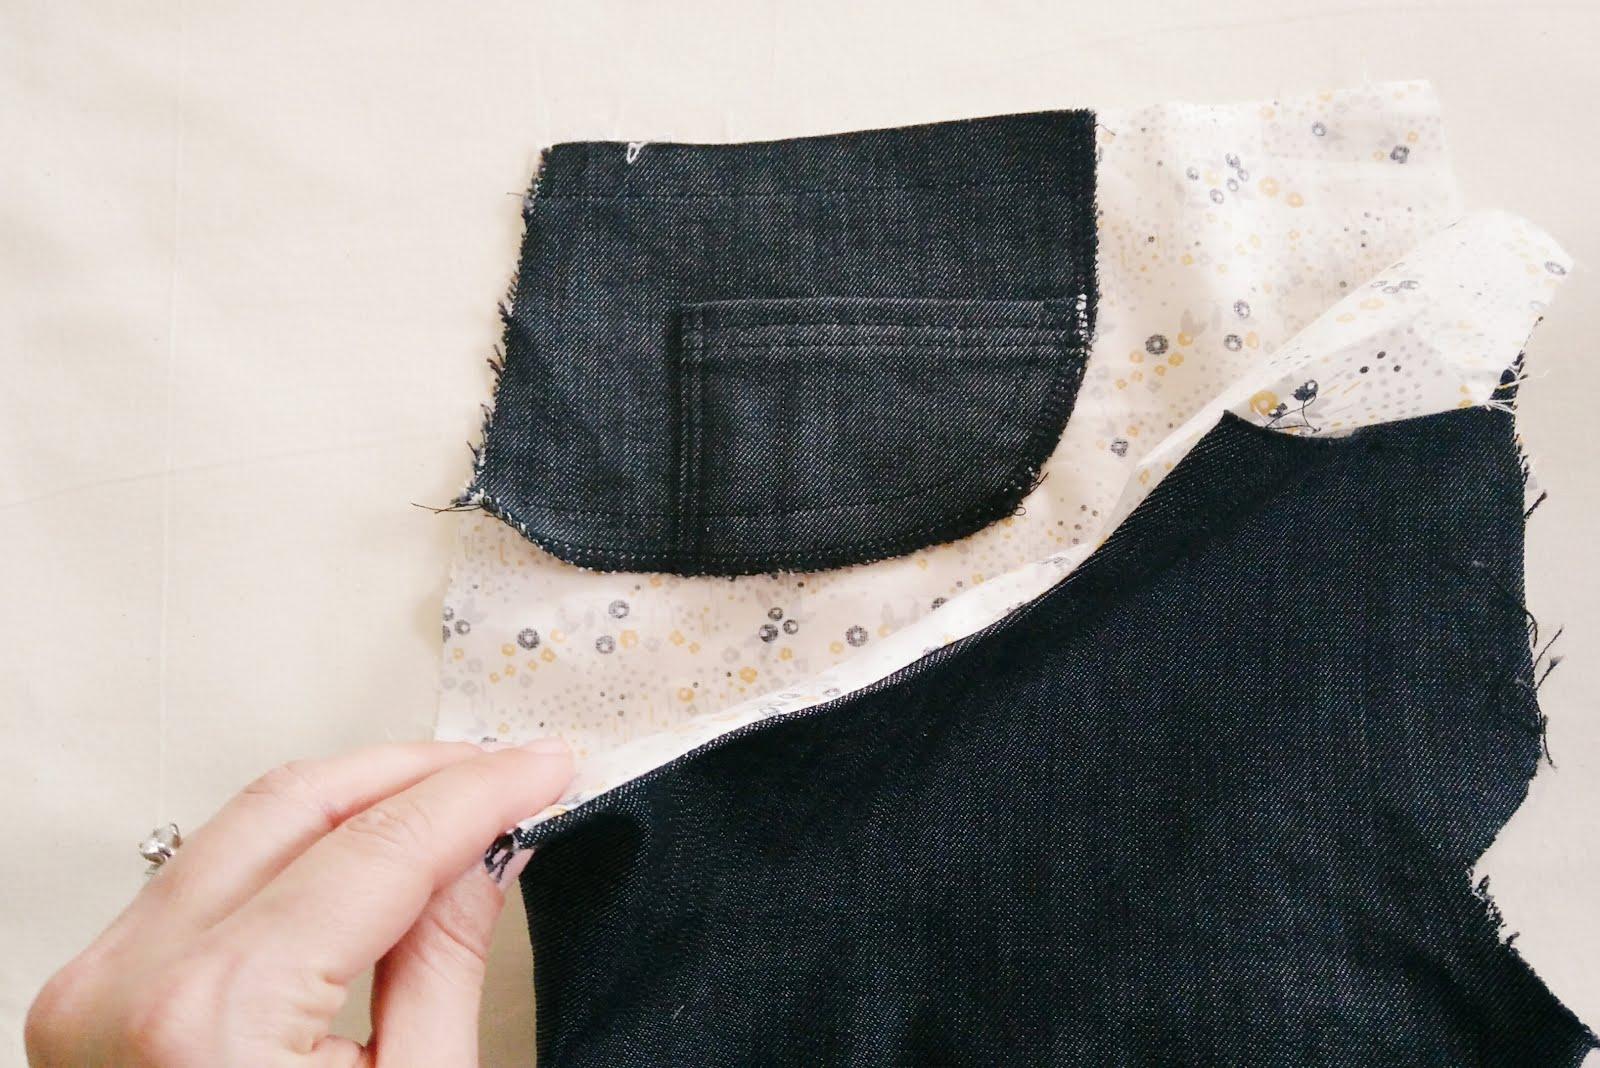 pocket stay Ginger jeans